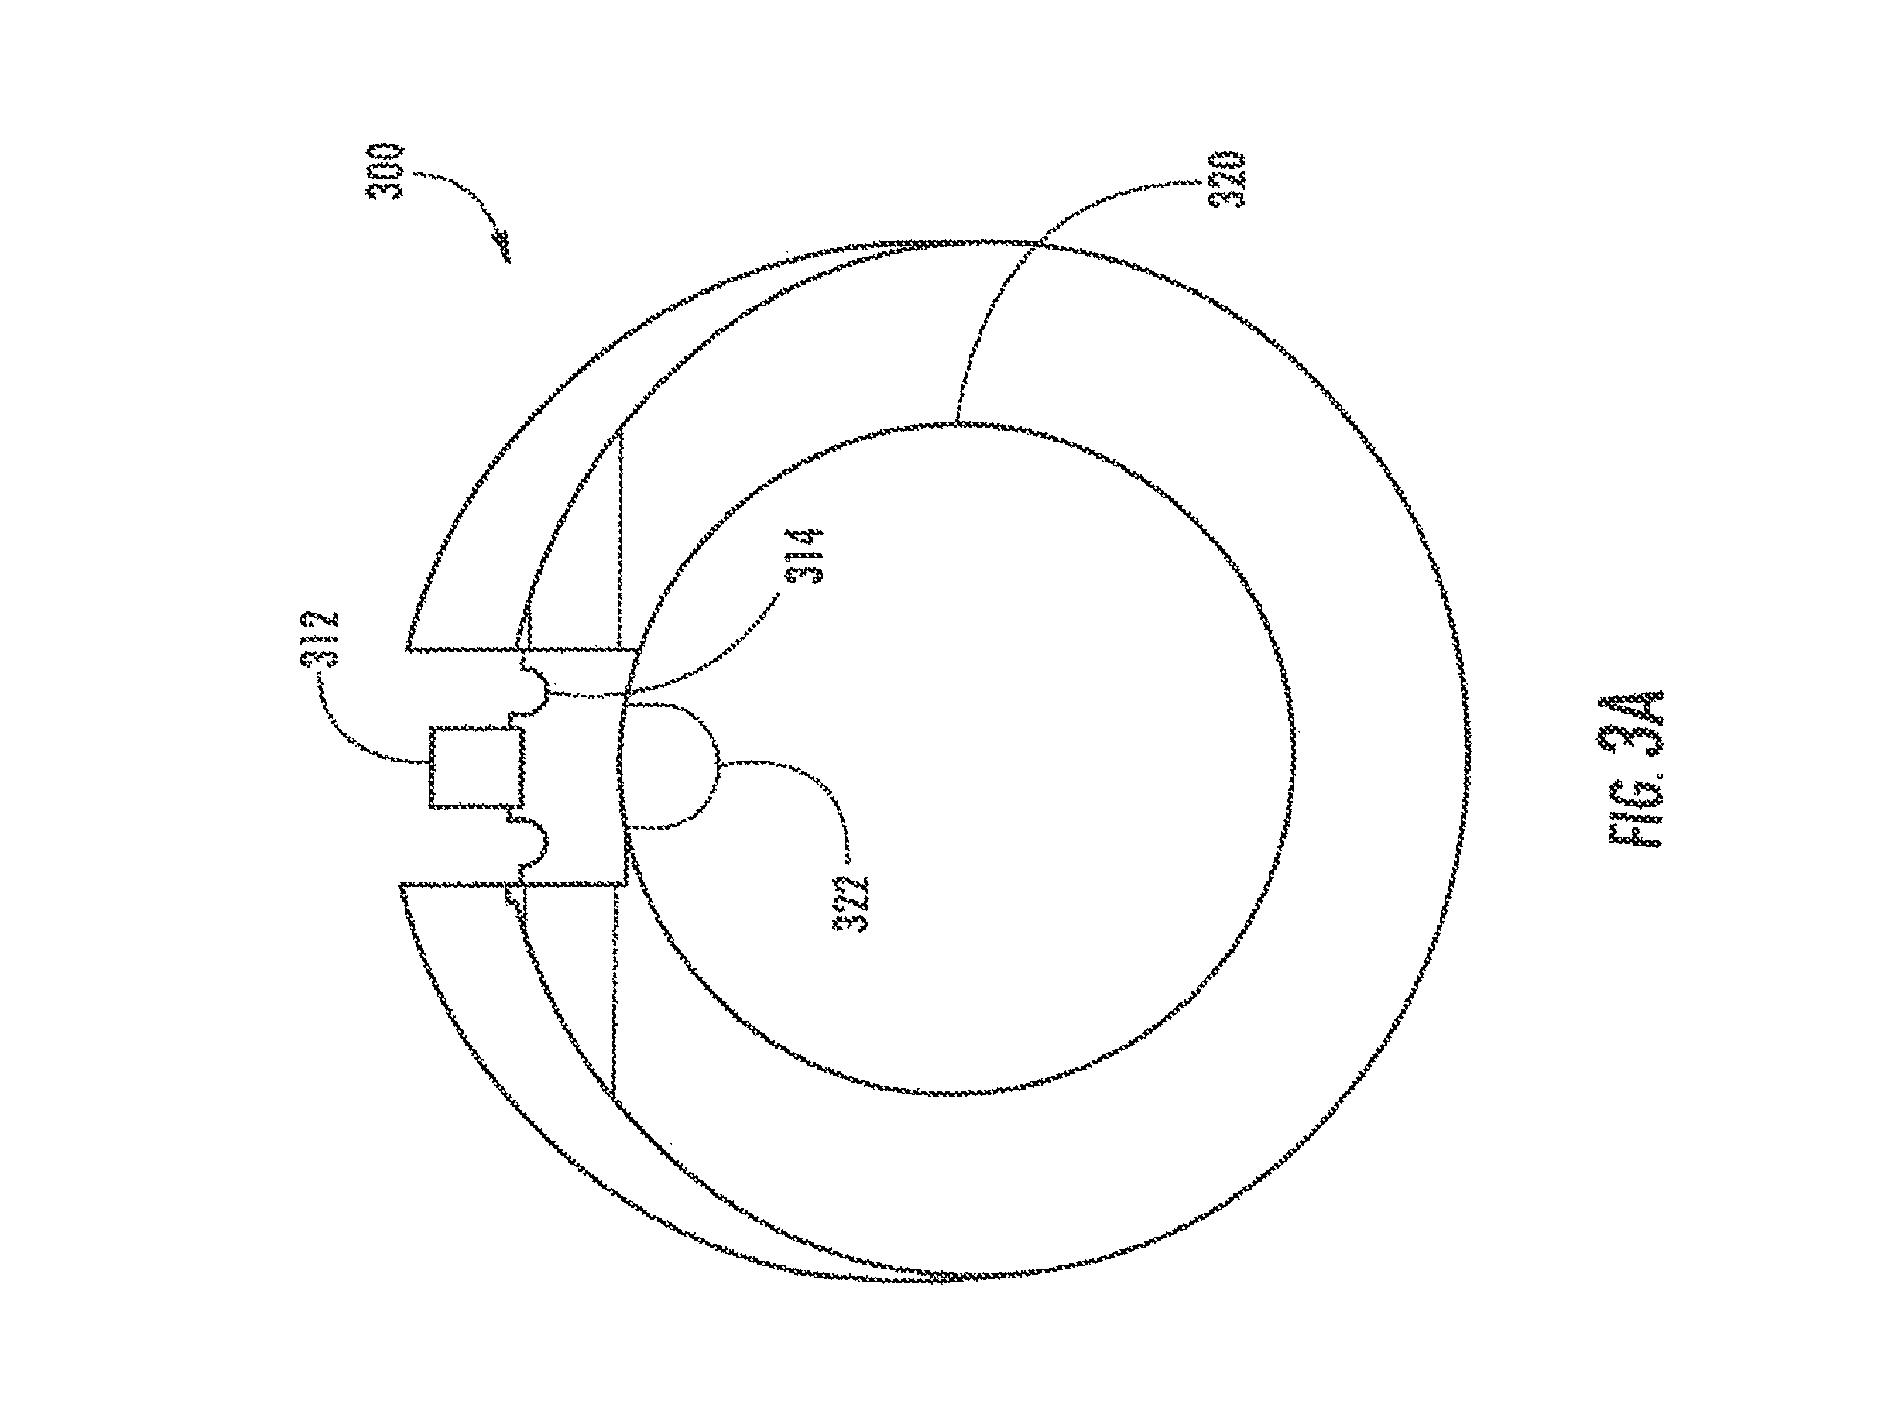 patent us 9 823 274 b2 Magnetek 6345 Wiring-Diagram patent